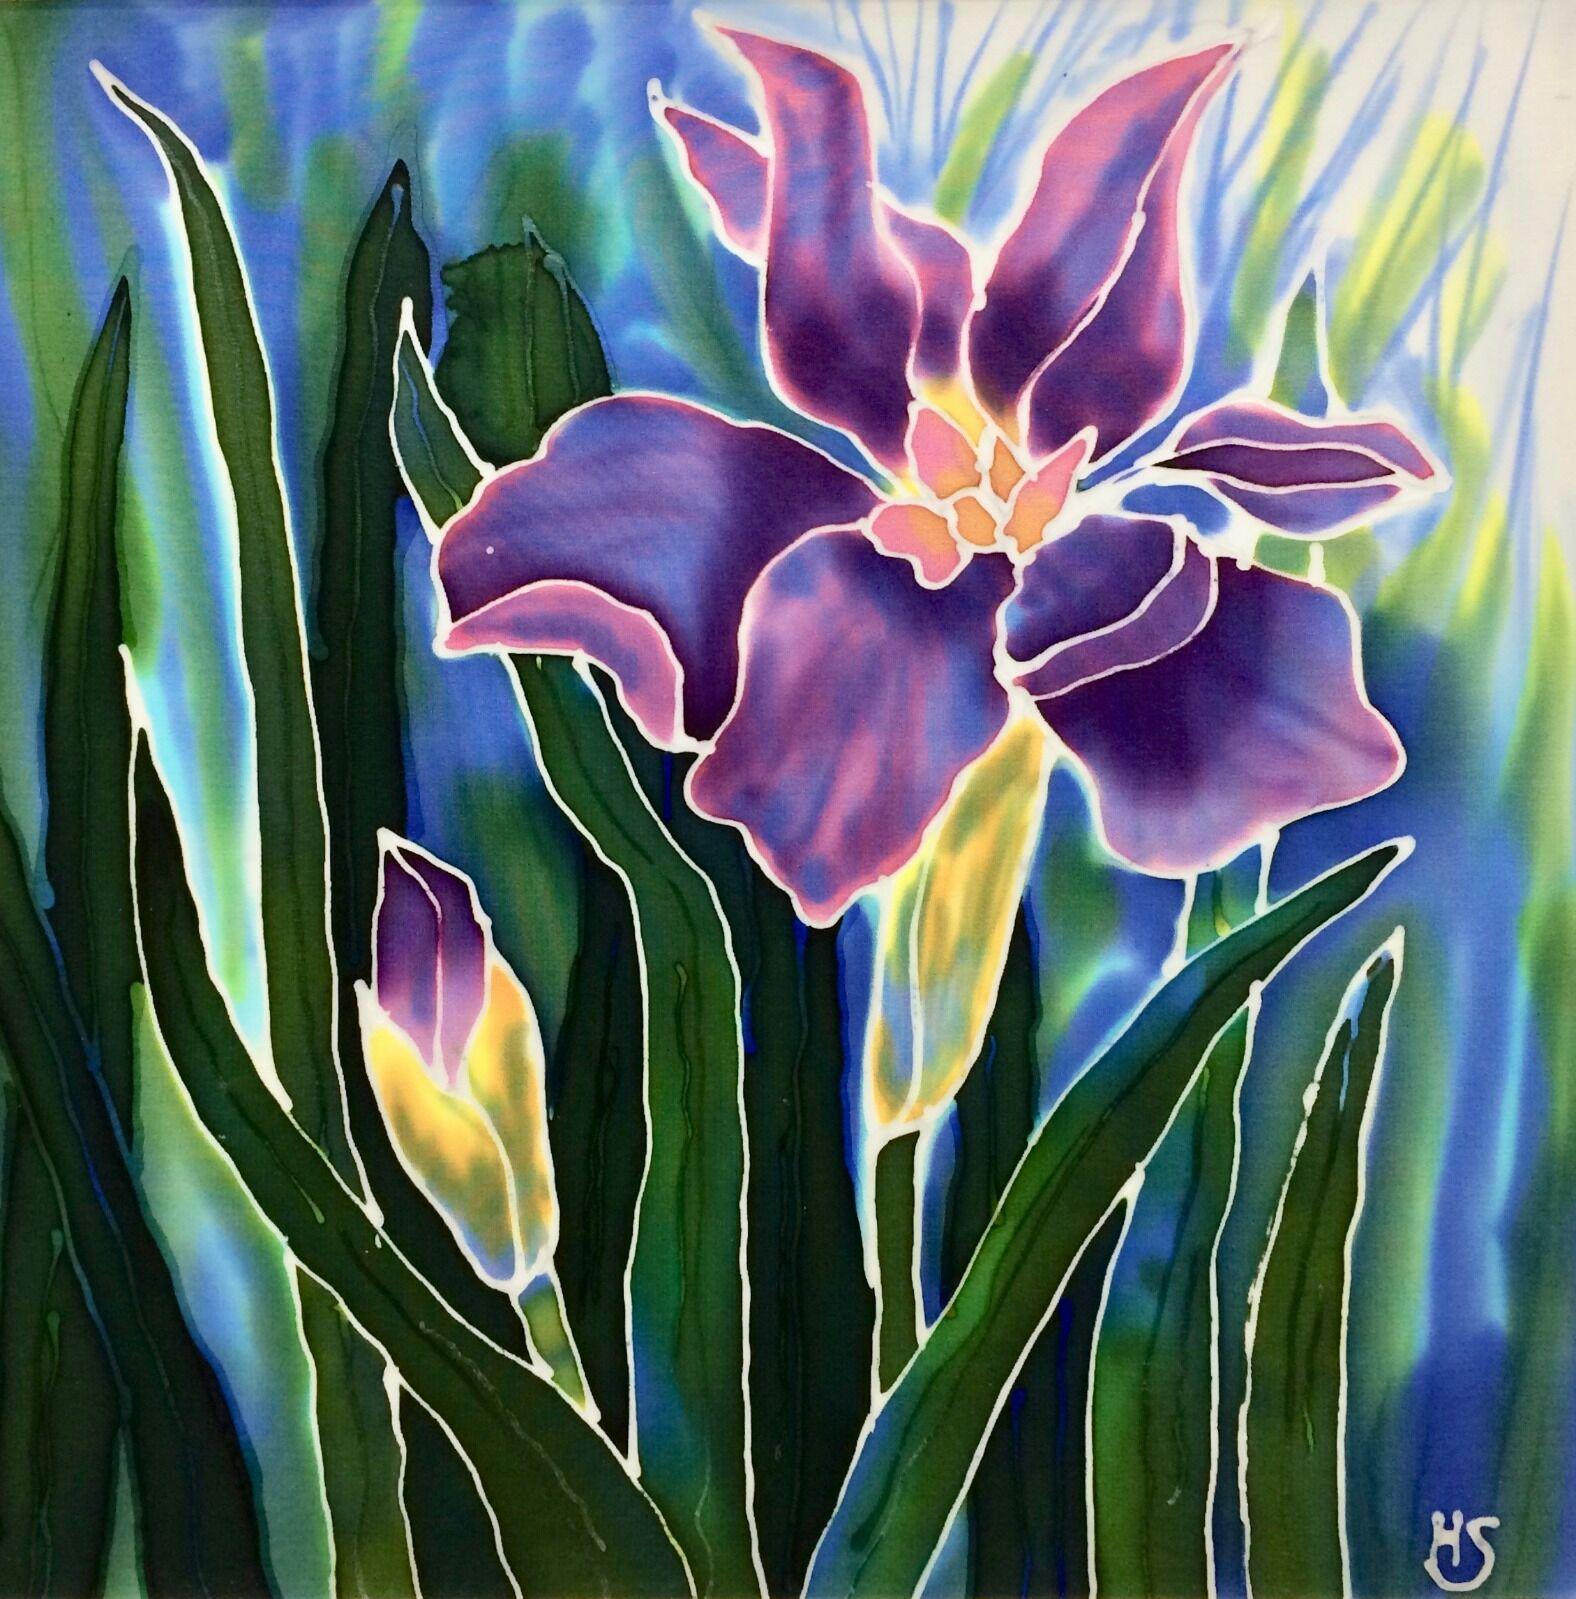 'Iris'. Original silk painting. mounted and framed, 50cm x 50cm